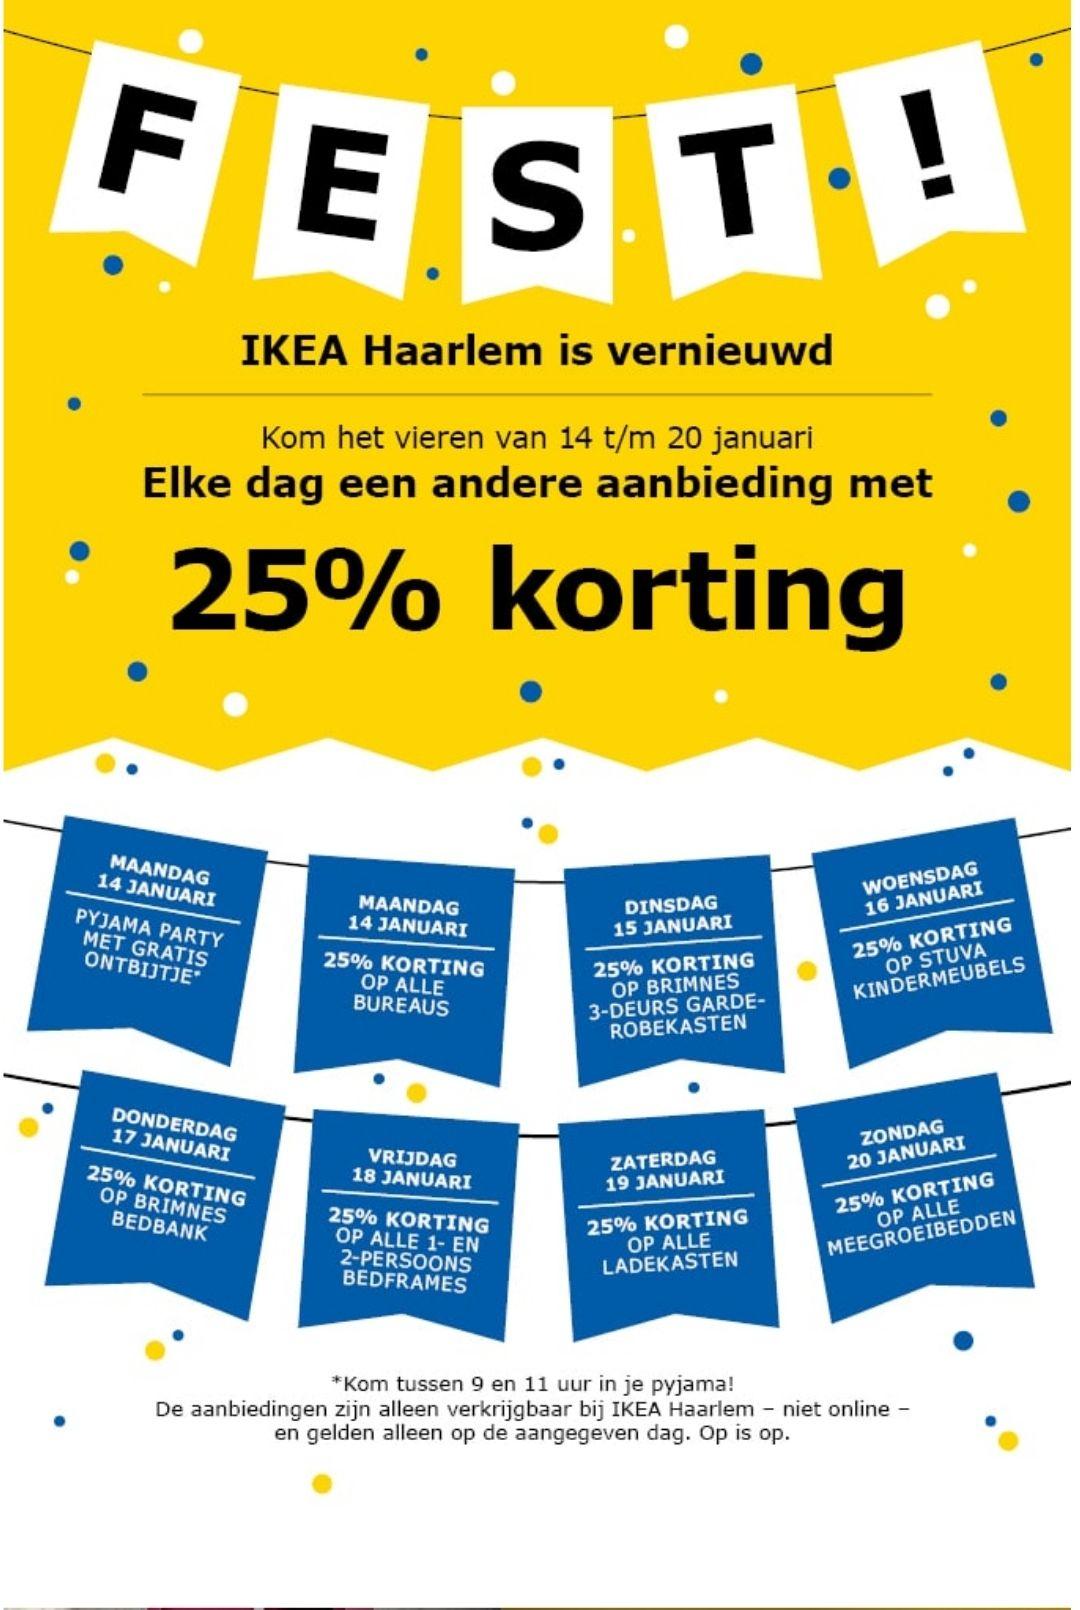 Fest At Ikea Haarlem Peppercom